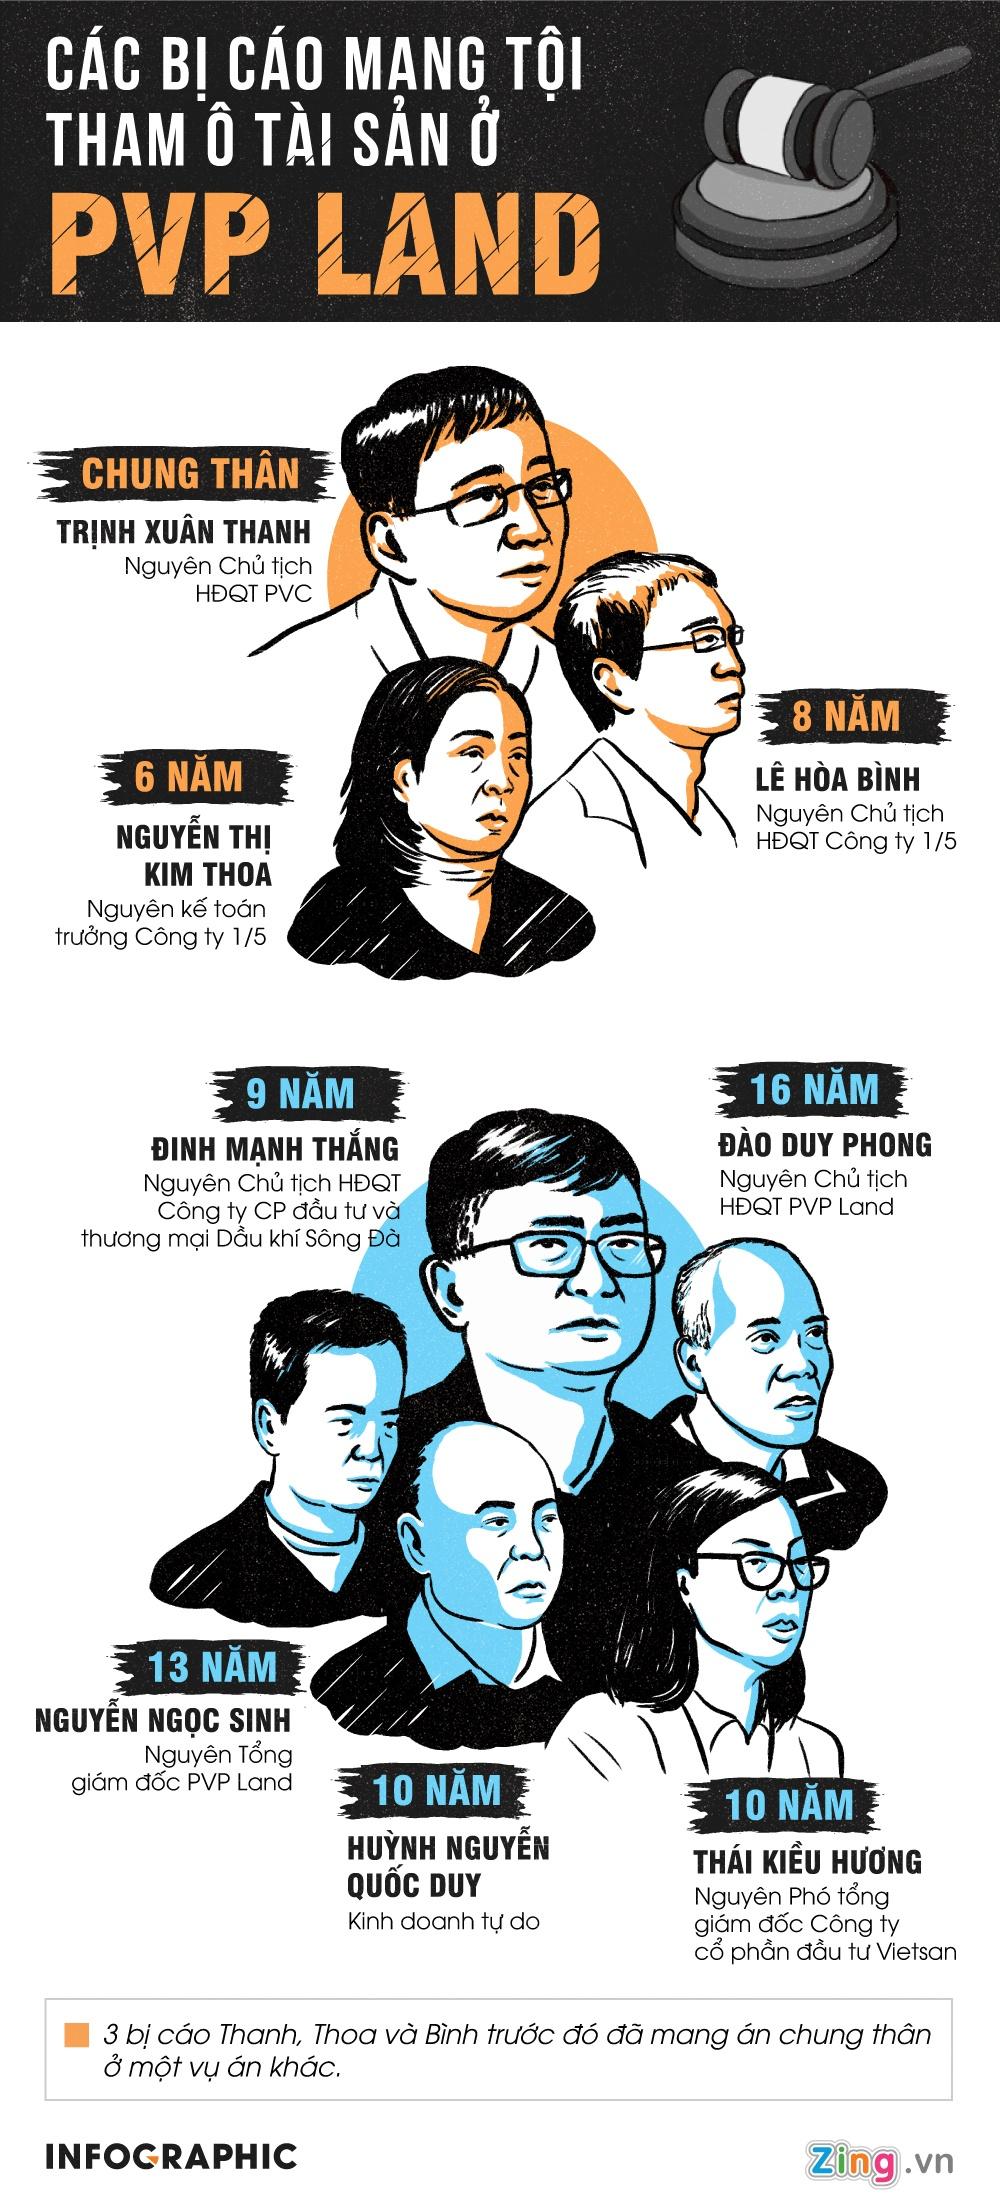 Tuyen an Trinh Xuan Thanh anh 1